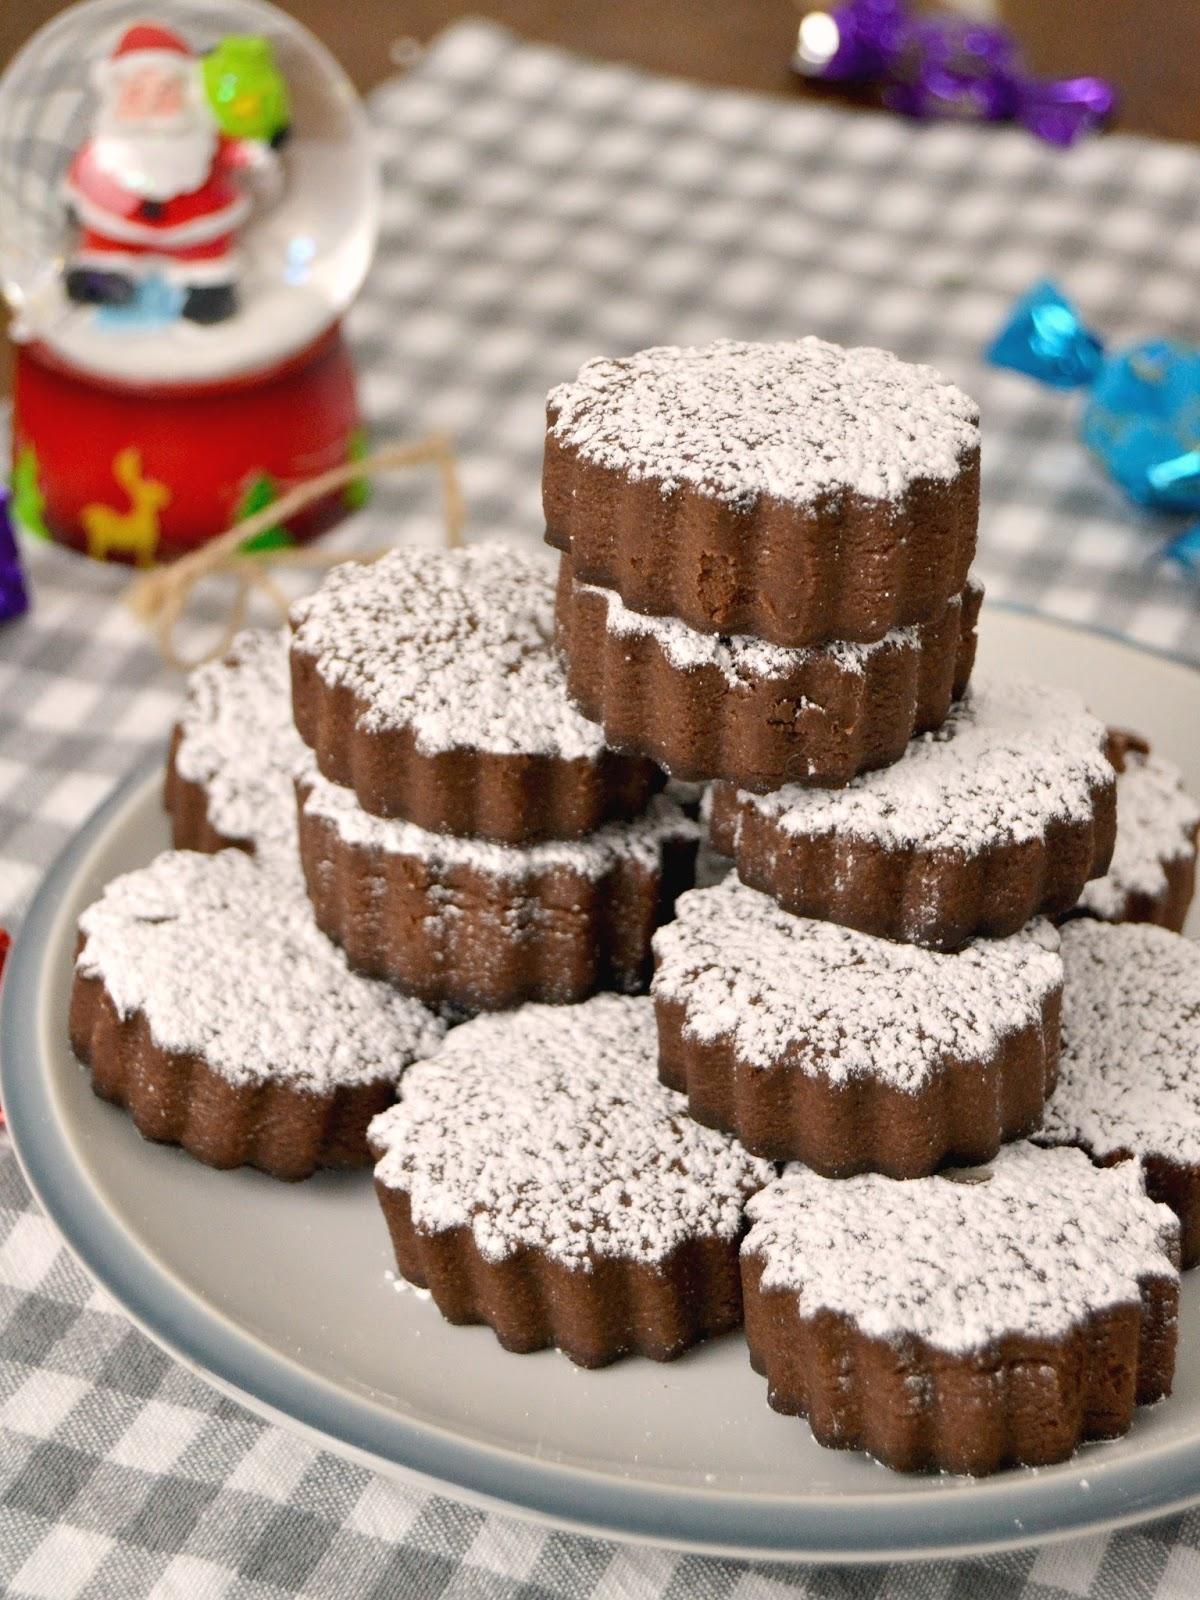 Mantecados de chocolate | Cuuking! Recetas de cocina